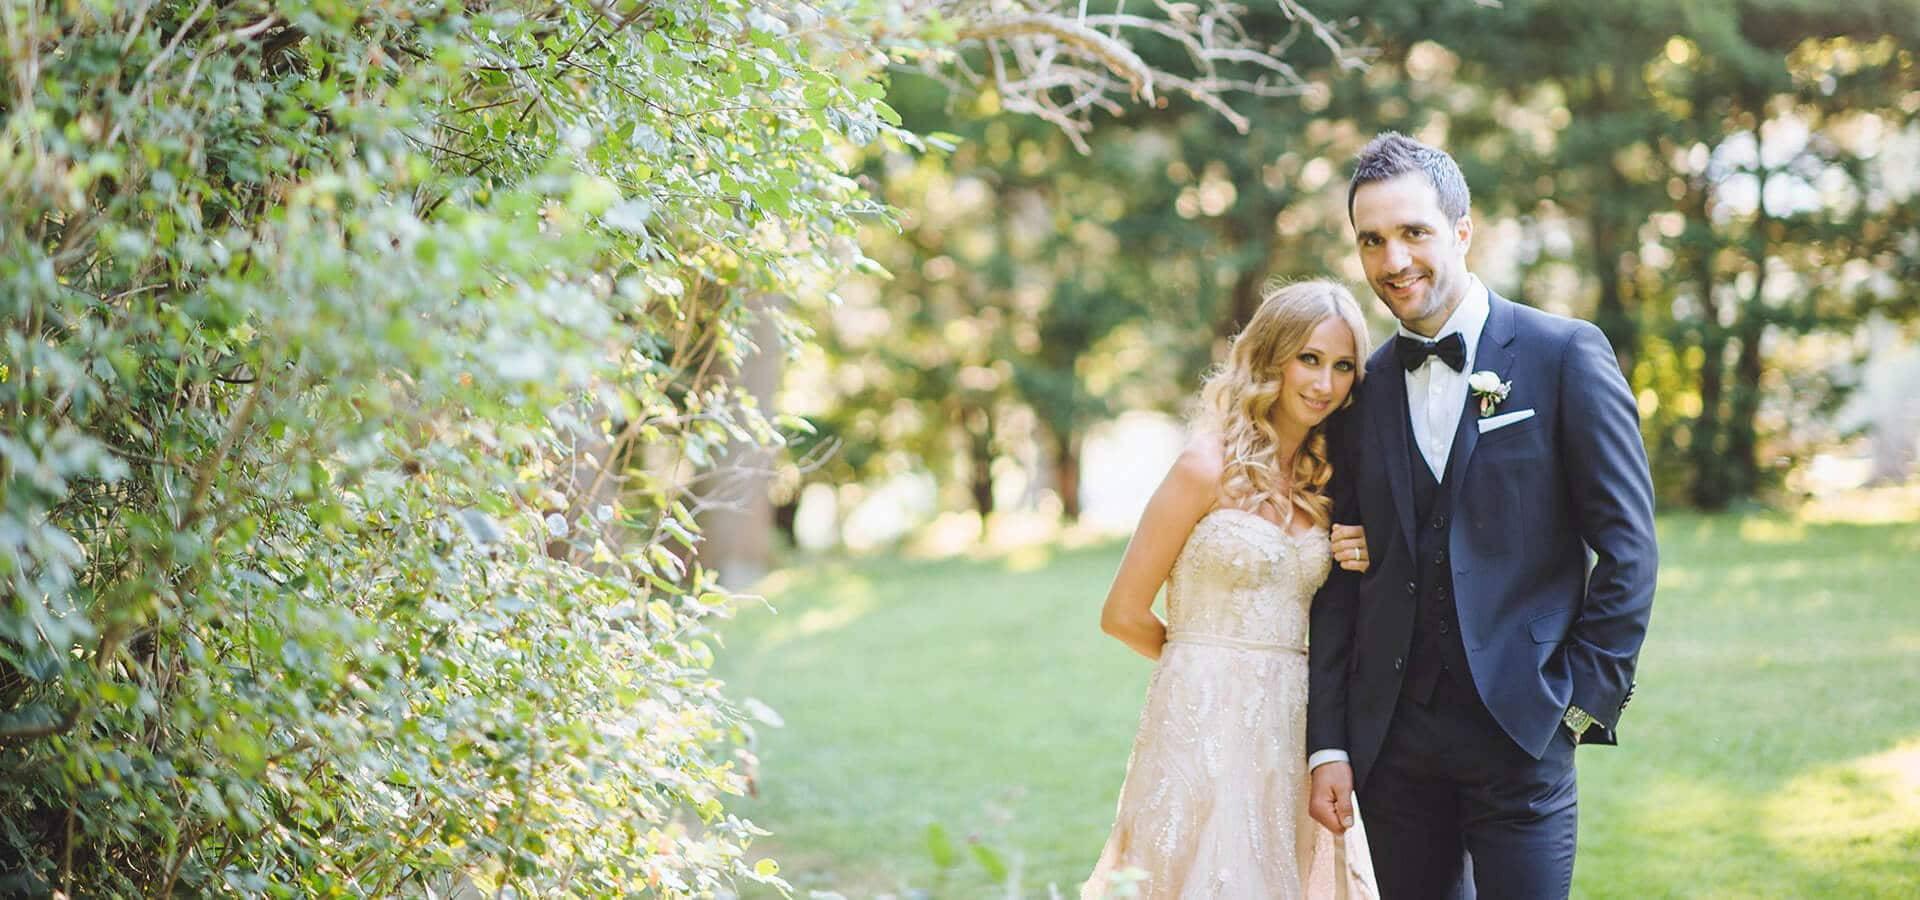 Hero image for Nicole & Joey's Elegant Toronto Wedding at Graydon Hall Manor